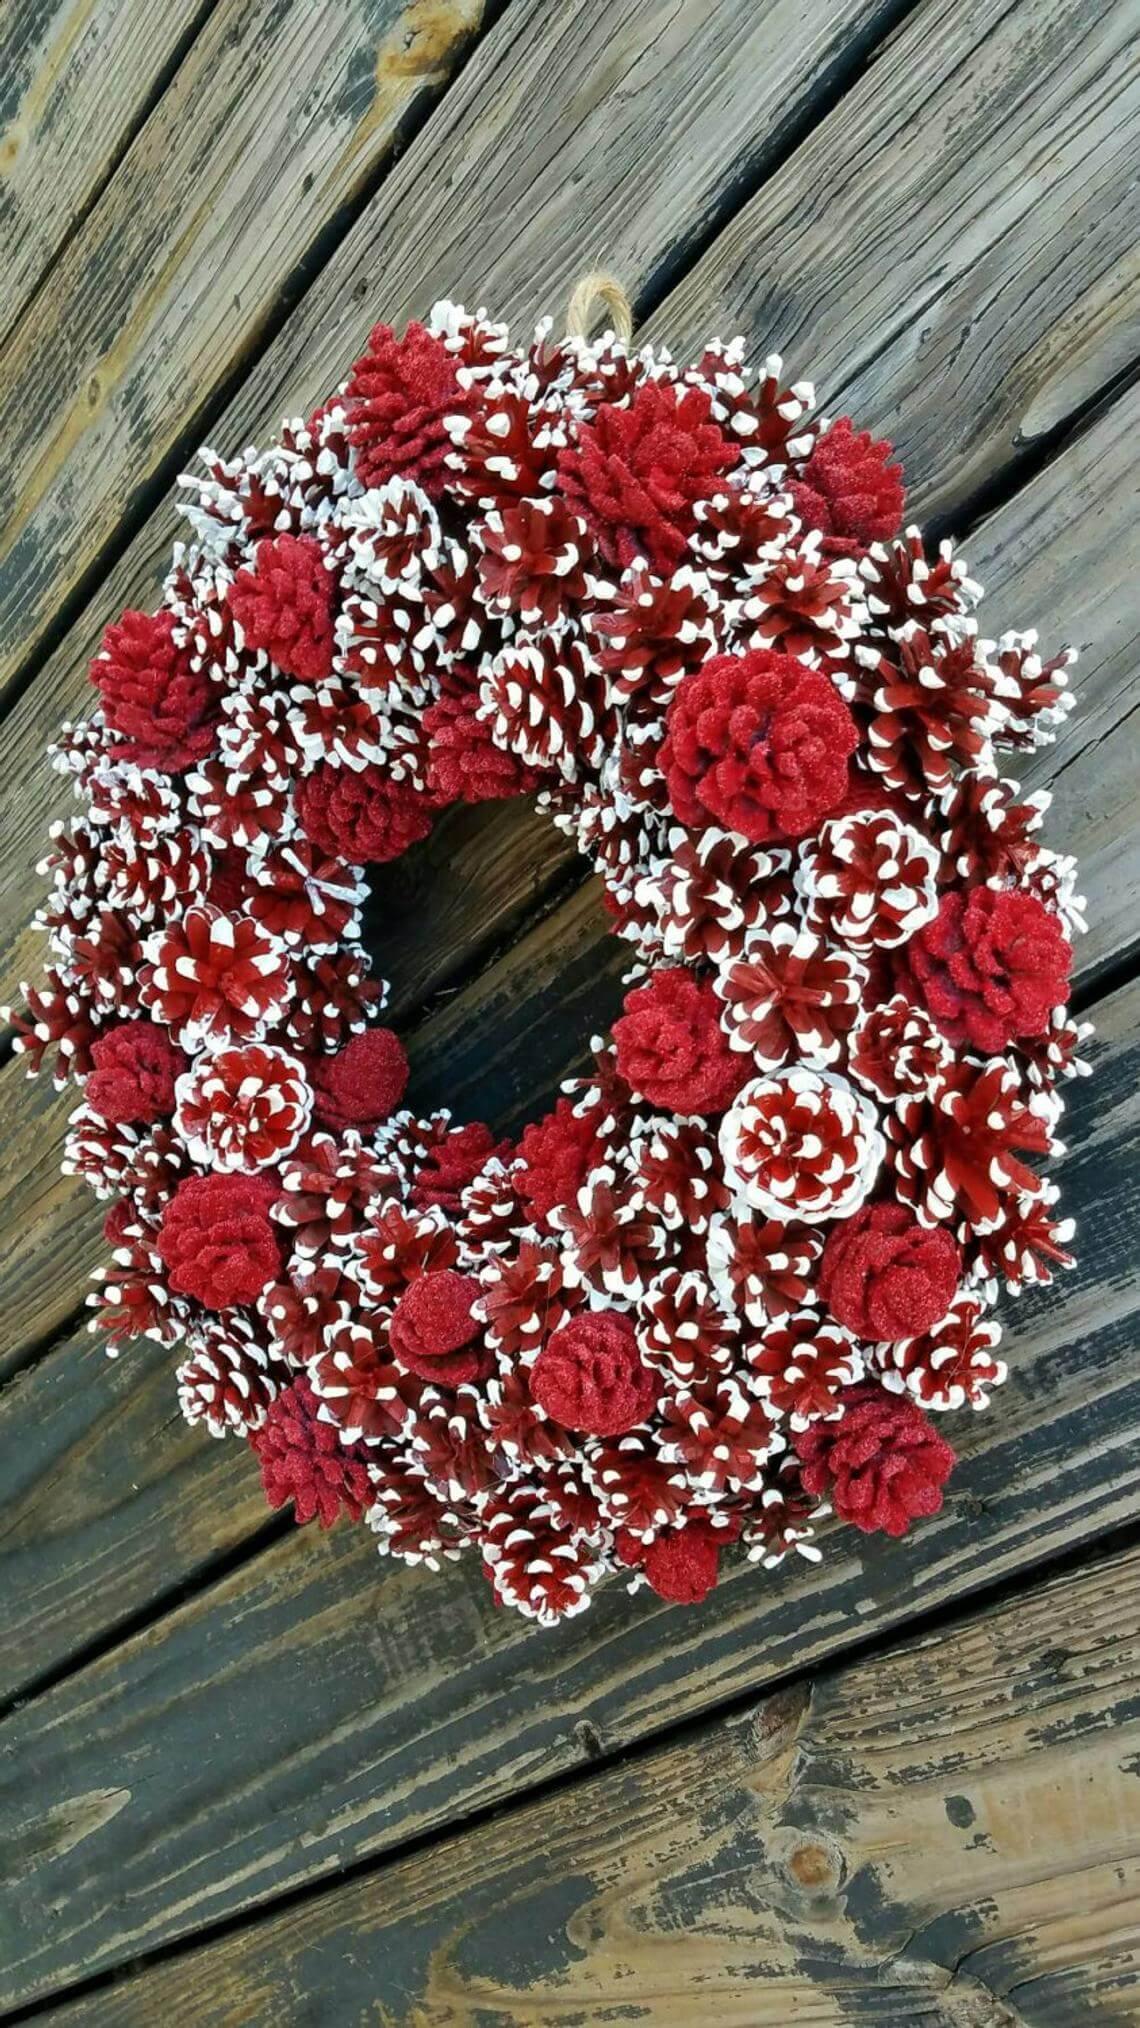 Unique Crimson and White Painted Pine Cone Wreath